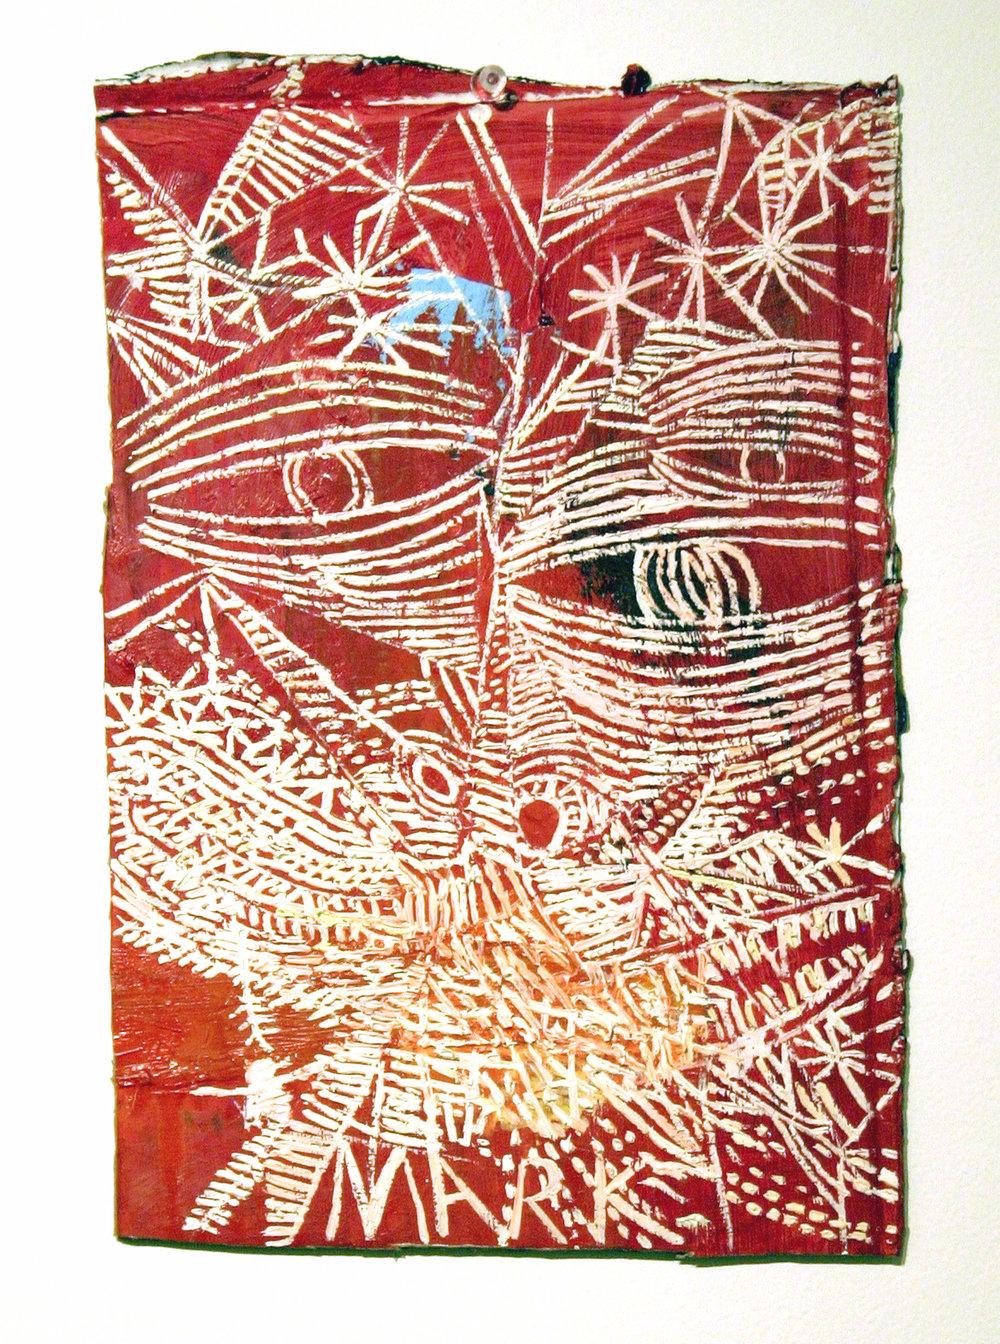 Mark Grotjahn  Untitled  2006 Oil on cardboard